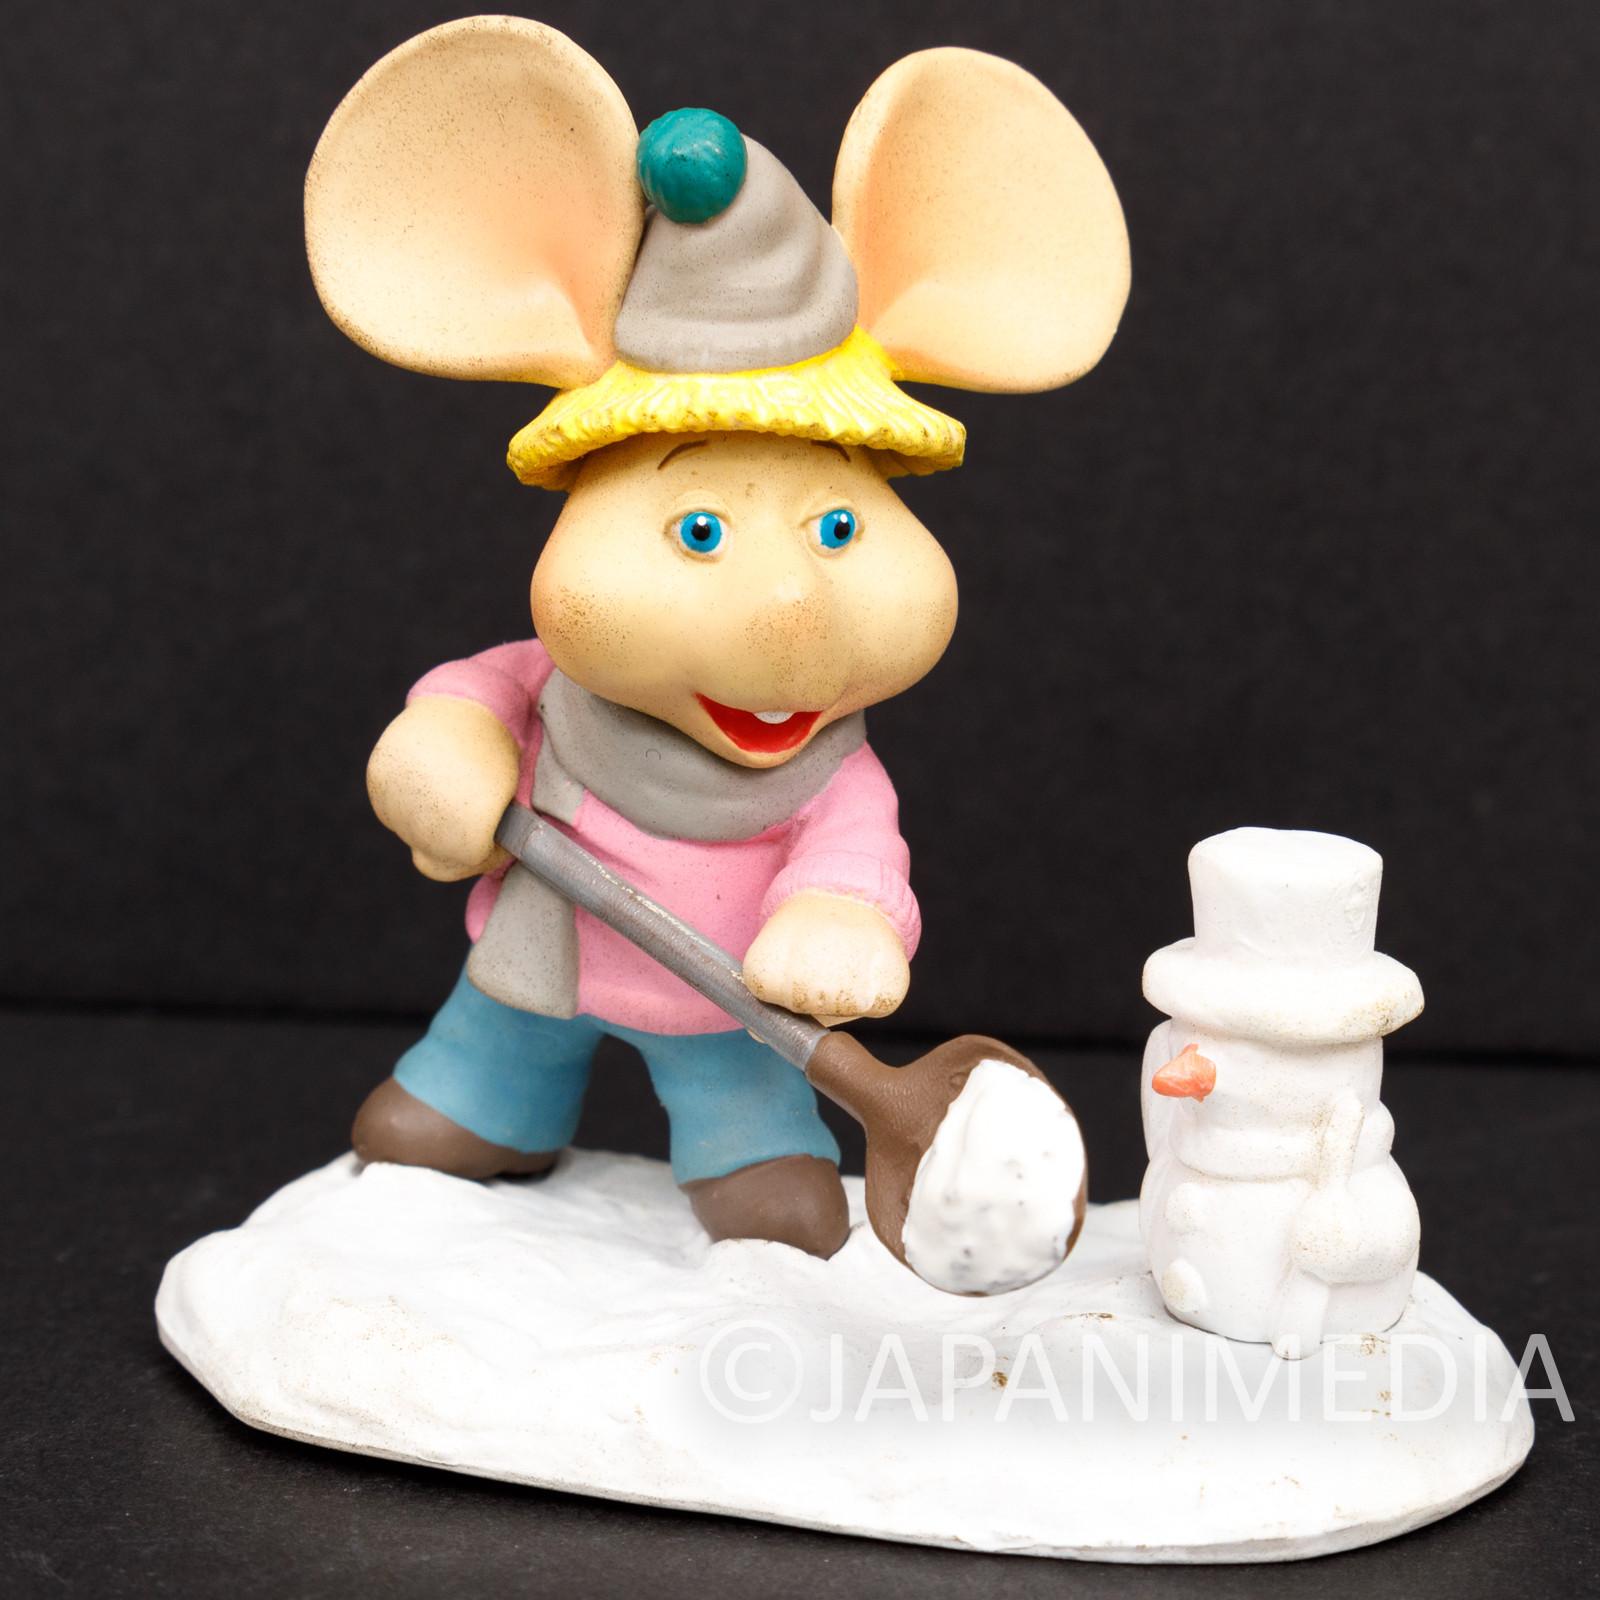 Topo Gigio with Snowman Miniature Diorama Figure